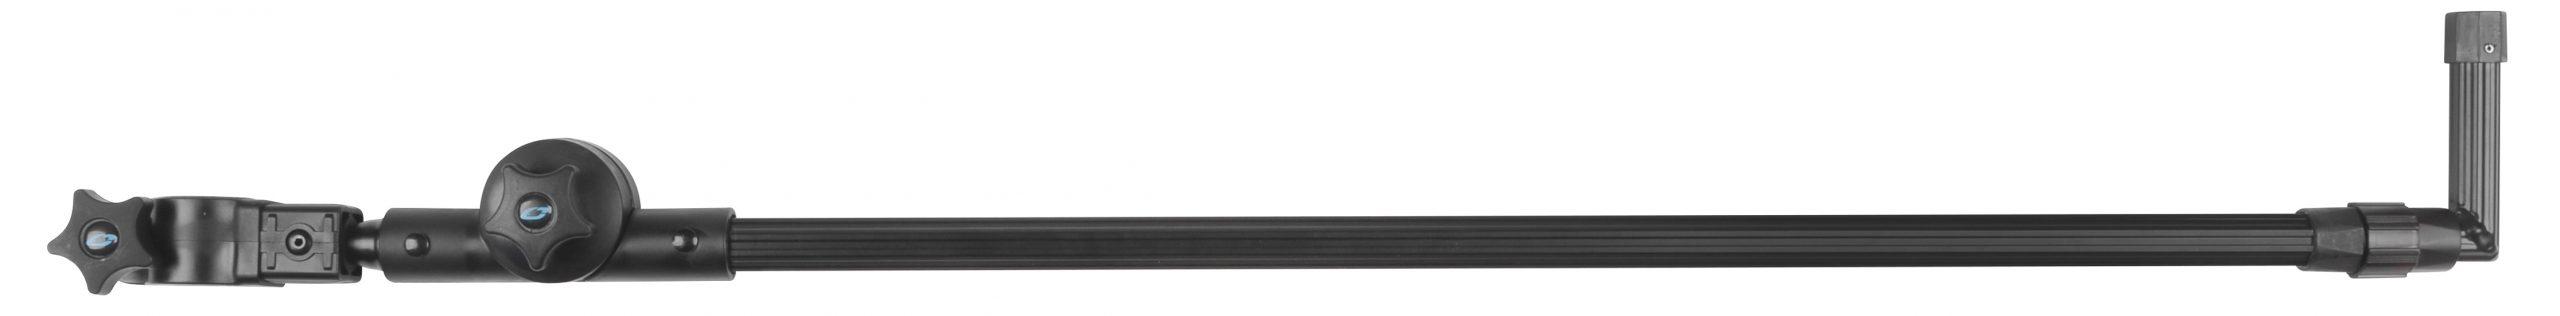 Cresta Tele Feeder Arm 130cm